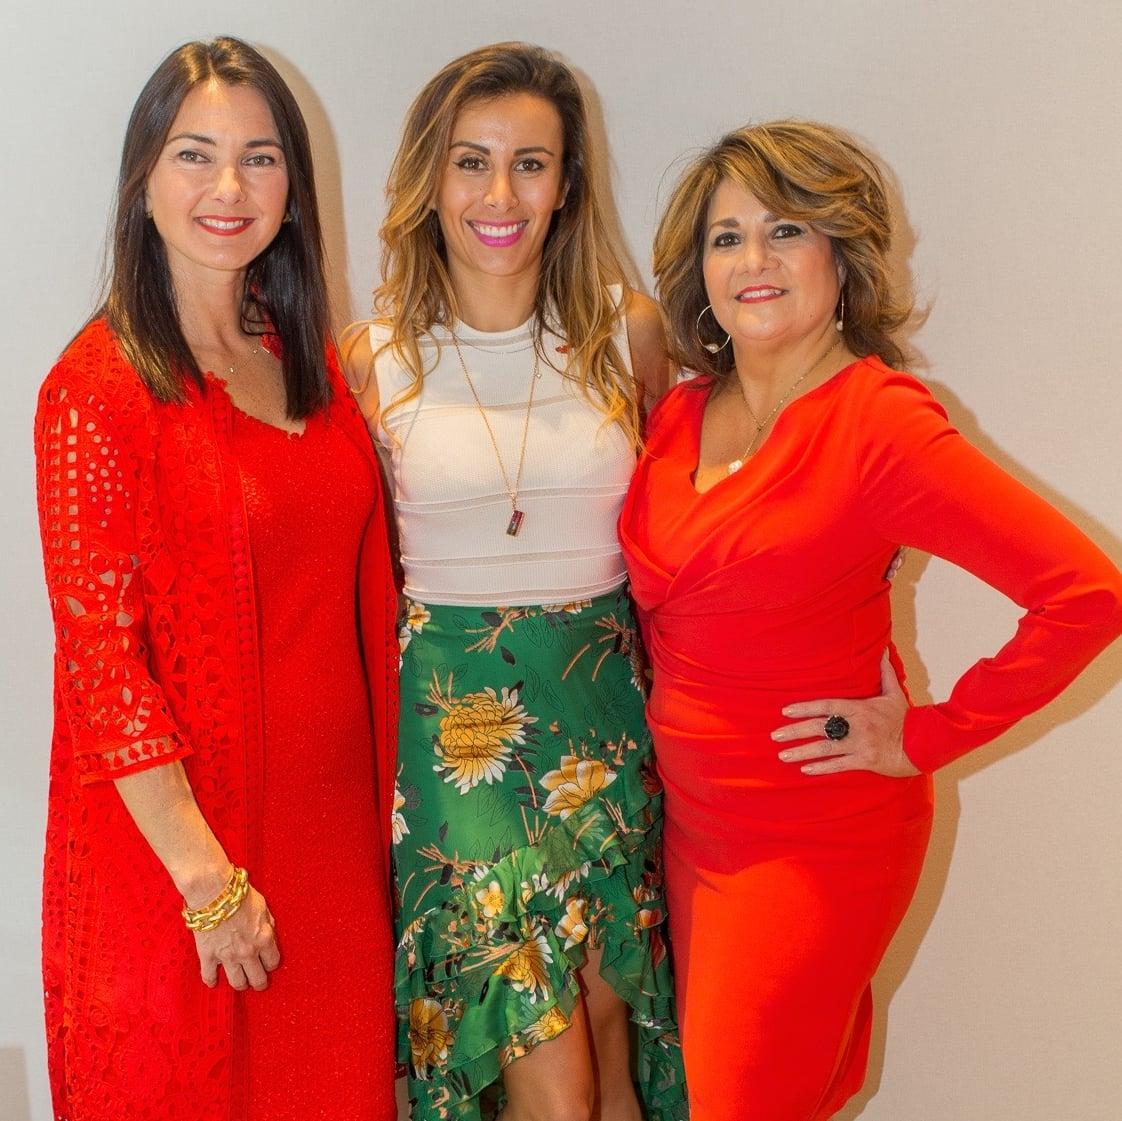 Dawn Cornell, Jewelry Designer Katherine Jetter, Vincette Vidaurri at Circle of Red